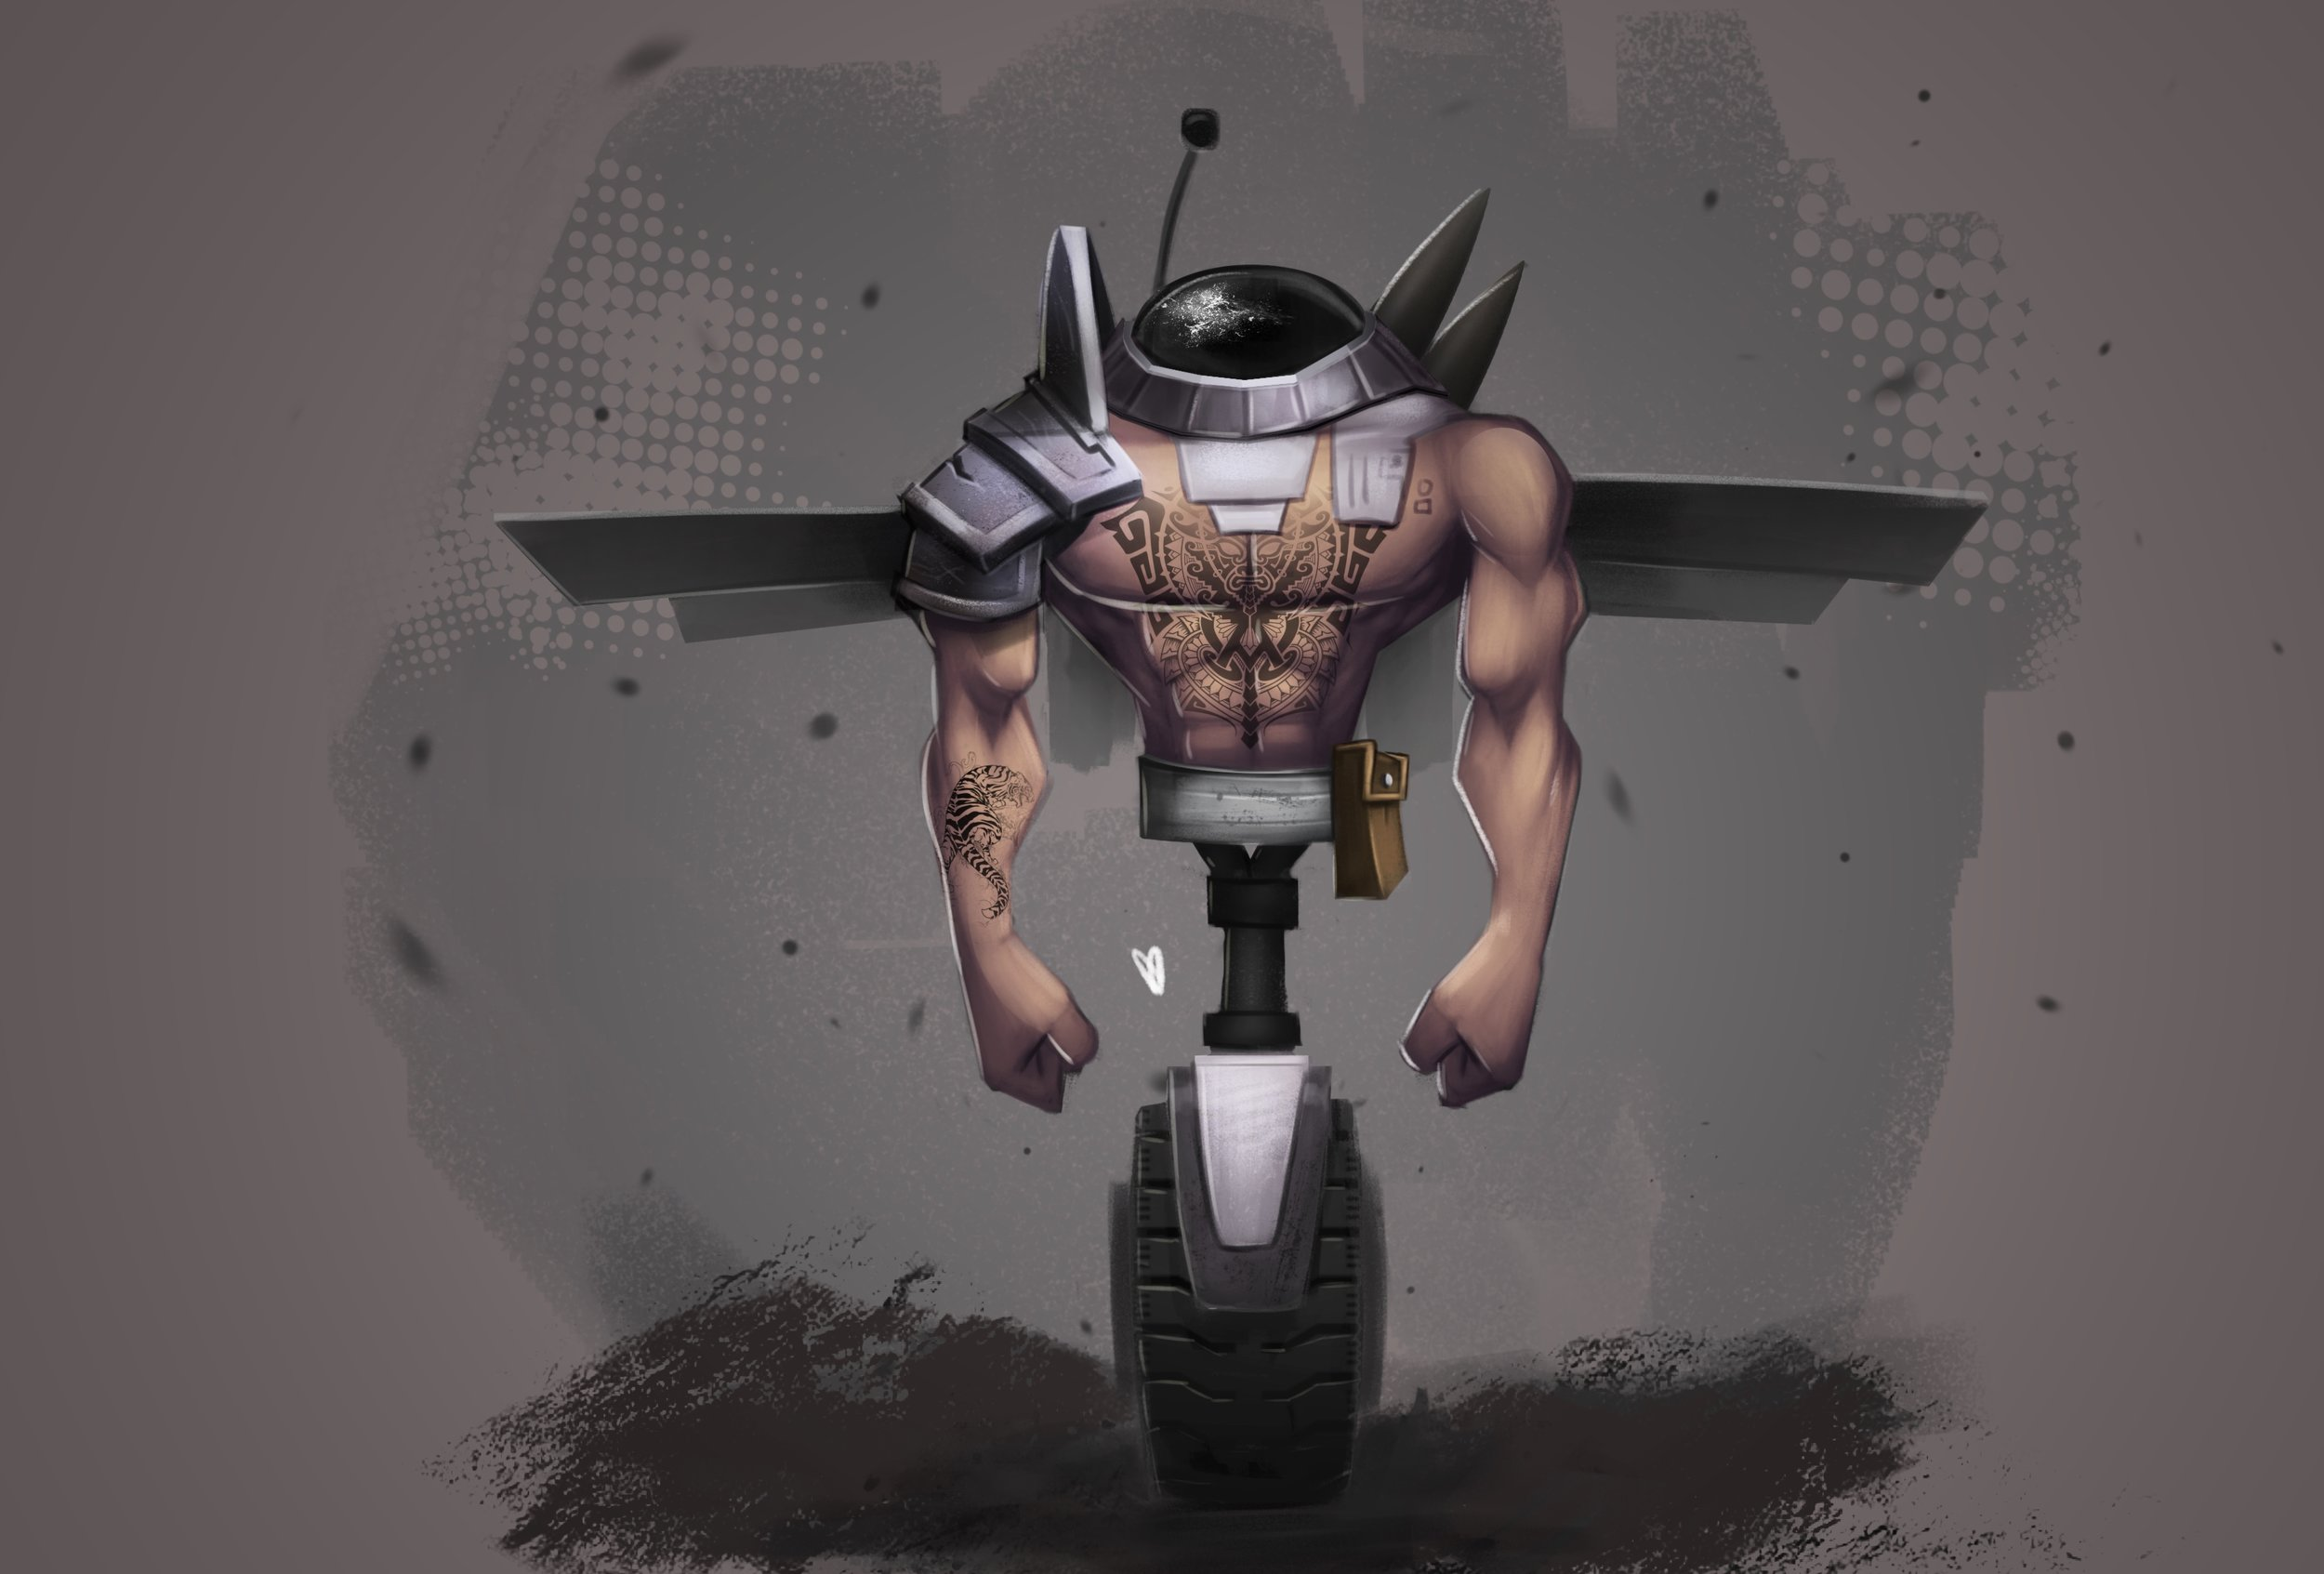 Fly bot concept art